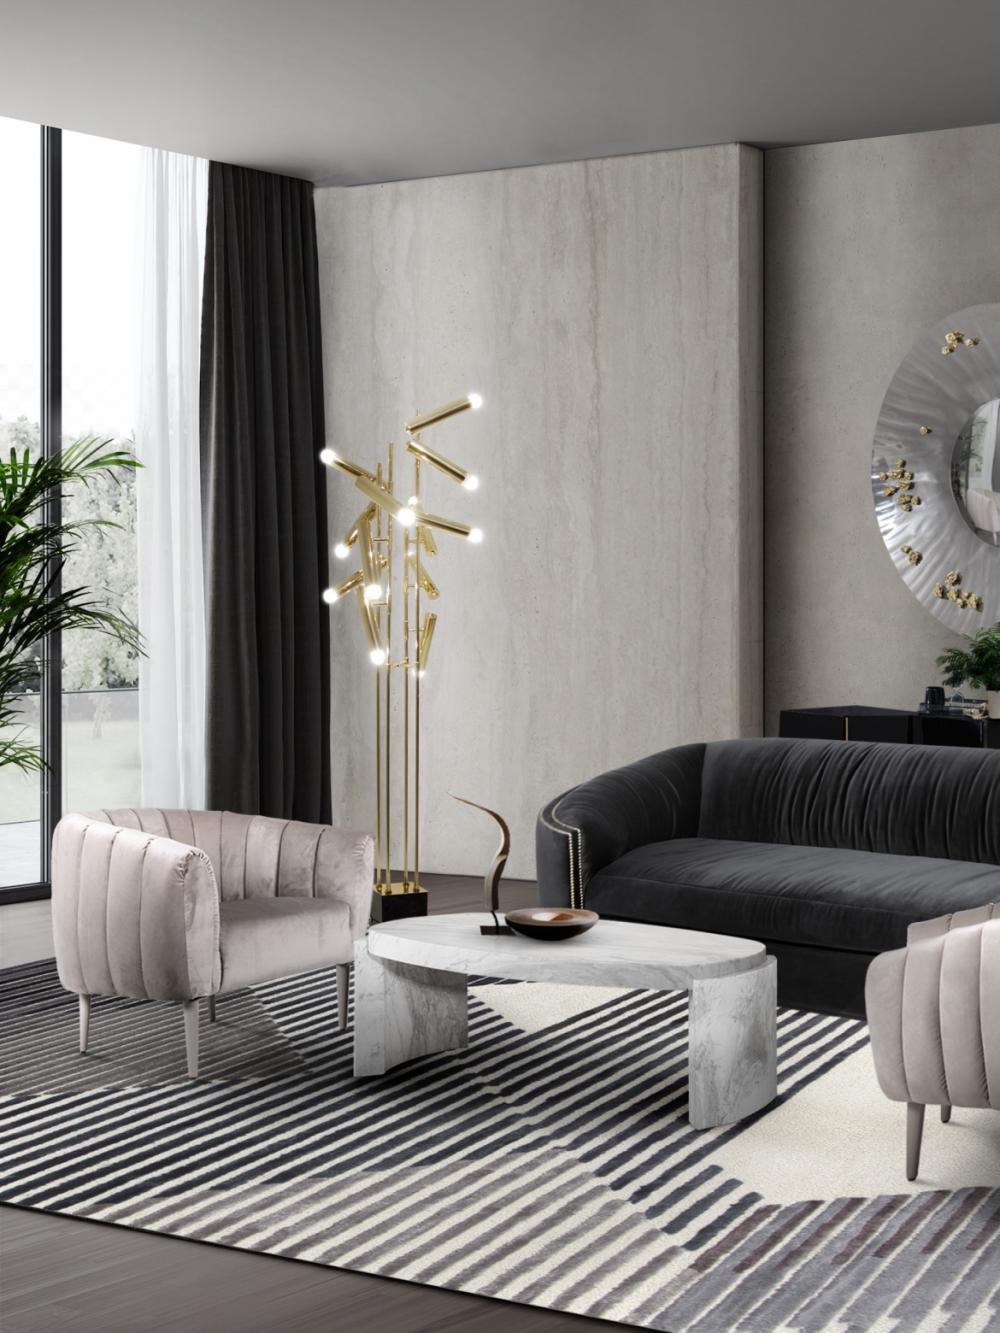 modern classic interior modern classic interior Modern Classic Interior| Interior Design Inspiration Modern Classic Interior 1